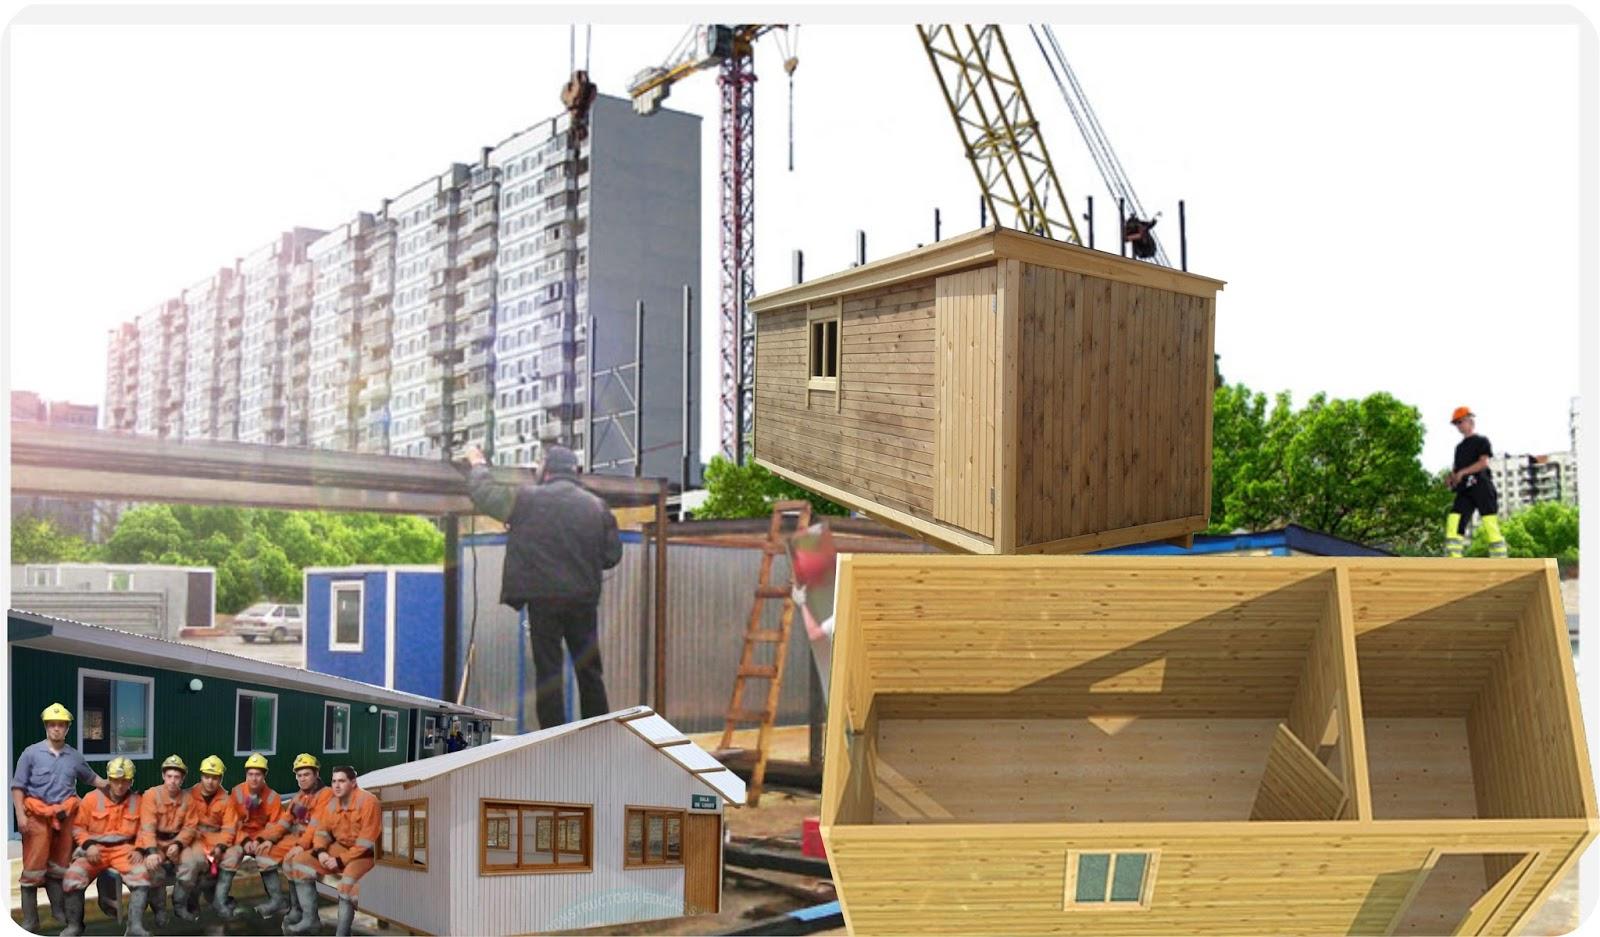 Casetas prefabricadas para construcci n packhogar - Feria de casas prefabricadas ...